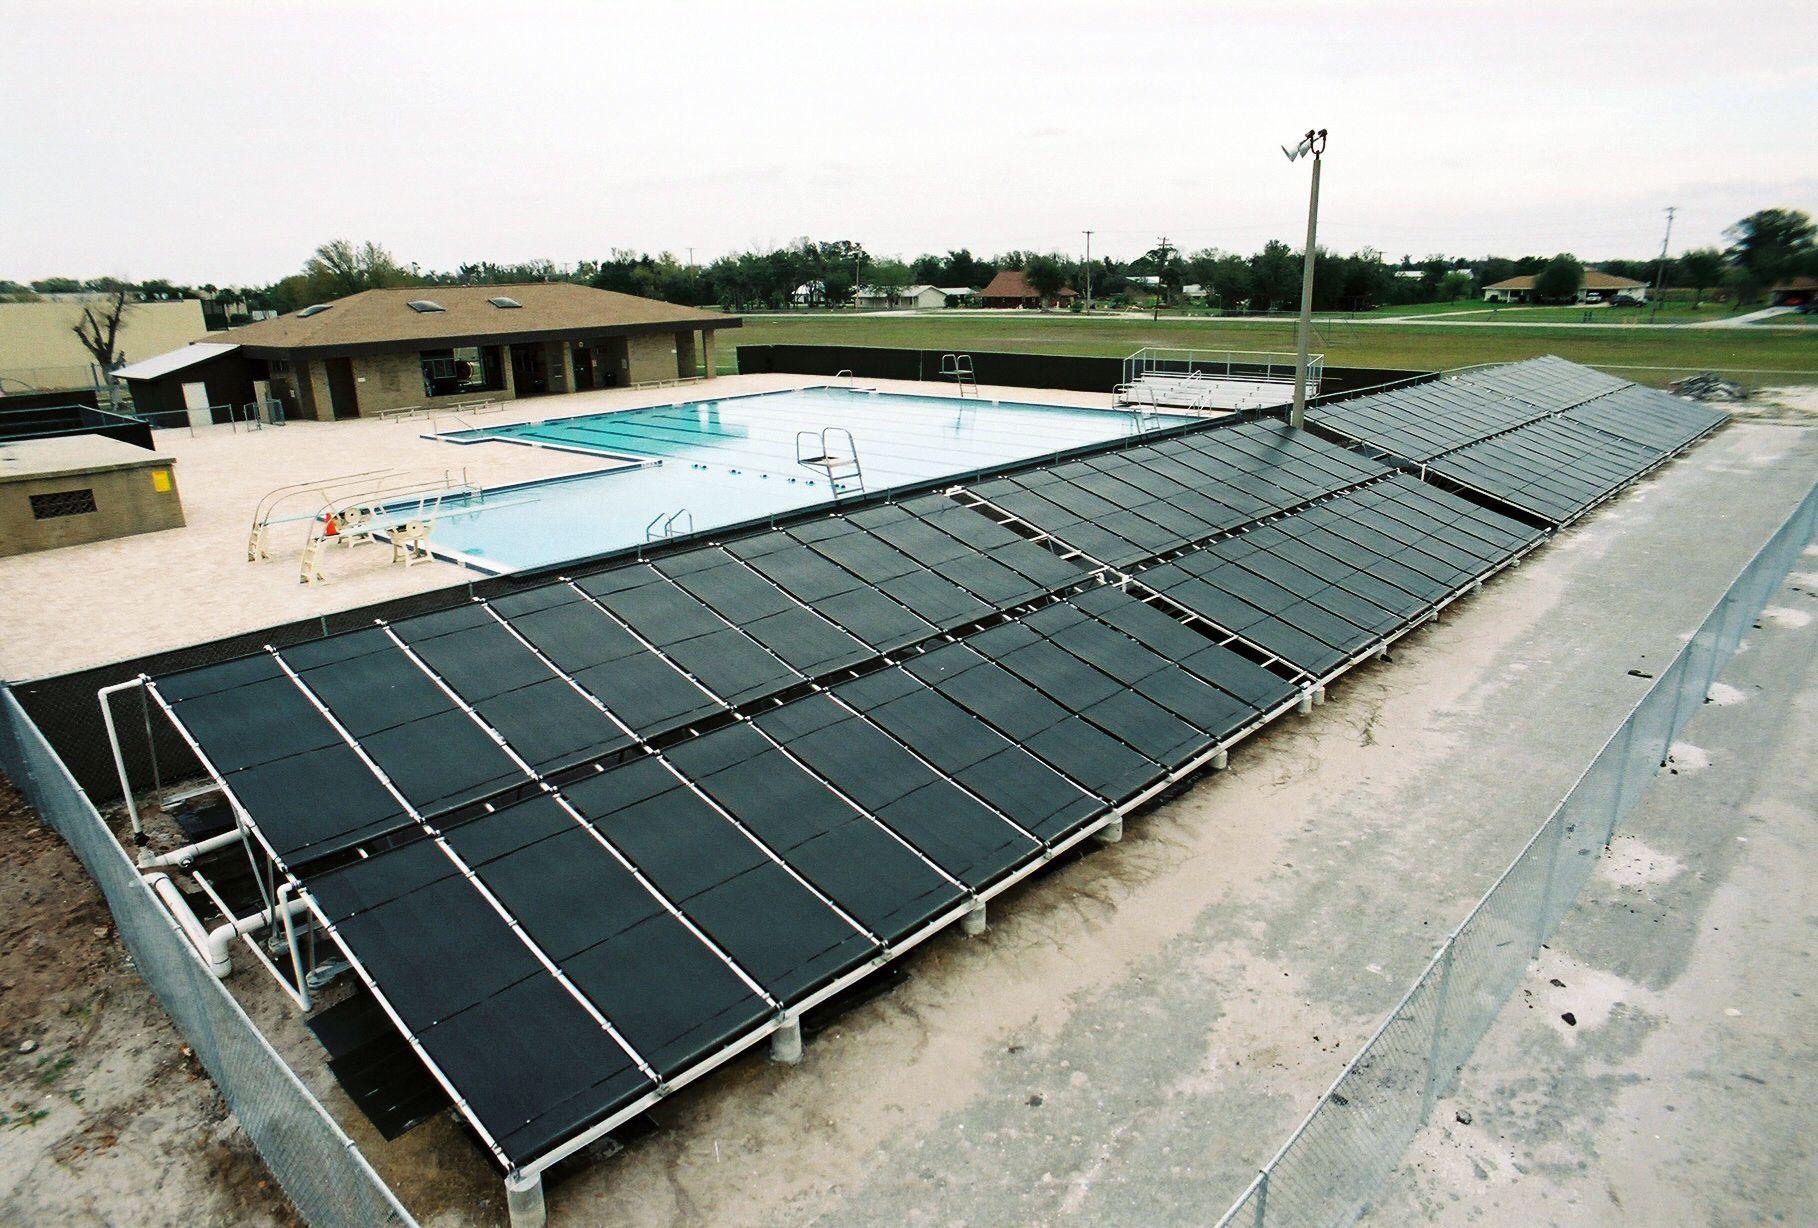 Vortex Solar Pool Heater Commercial Solar Pool Heater 80 Vortex 4 X 12 Solar Pool Panels Www Diysolarpoo Solar Pool Solar Pool Heater Pool Solar Panels